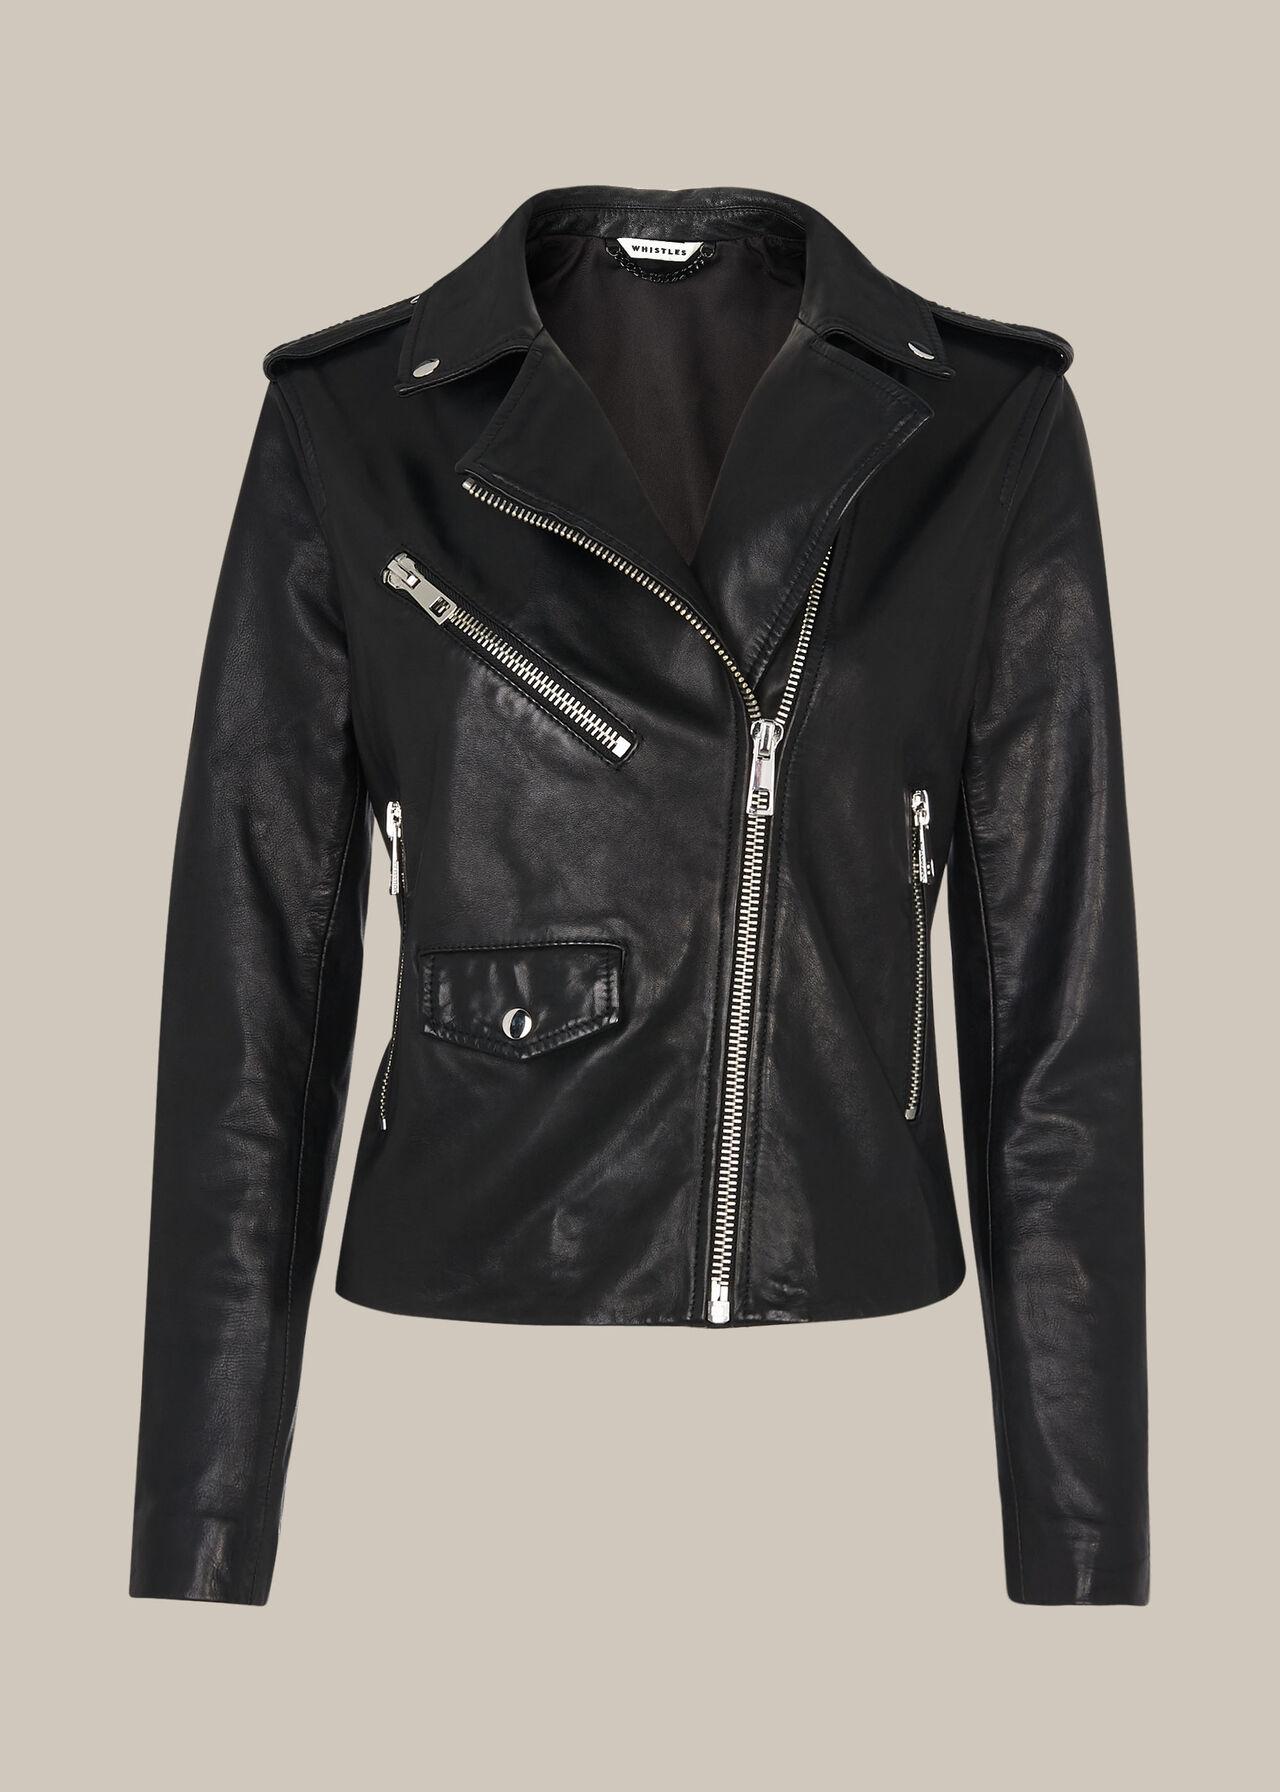 Black Agnes Pocket Leather Jacket | WHISTLES | Whistles